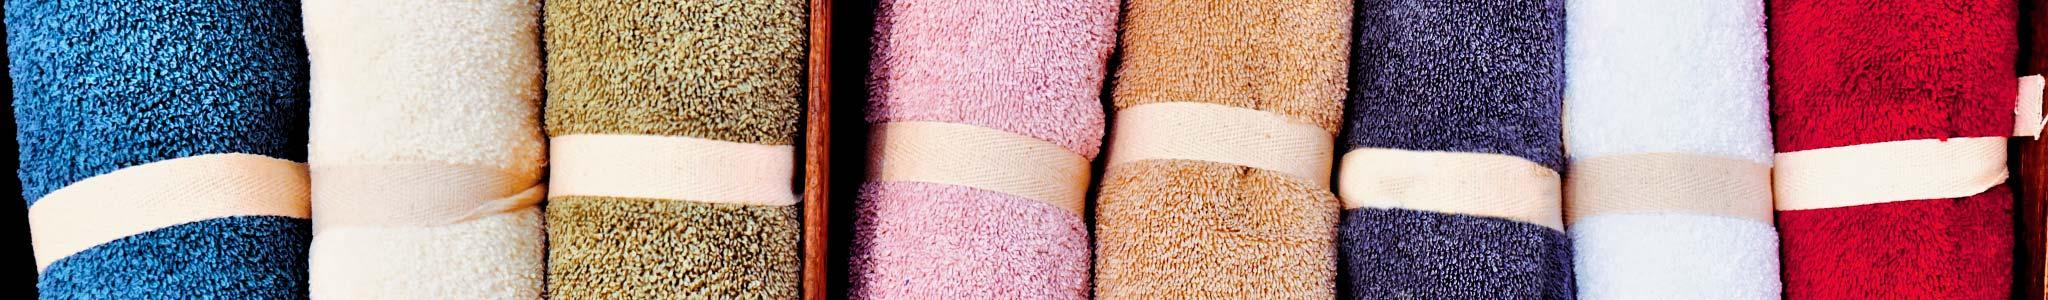 asciugamani bagno Genova